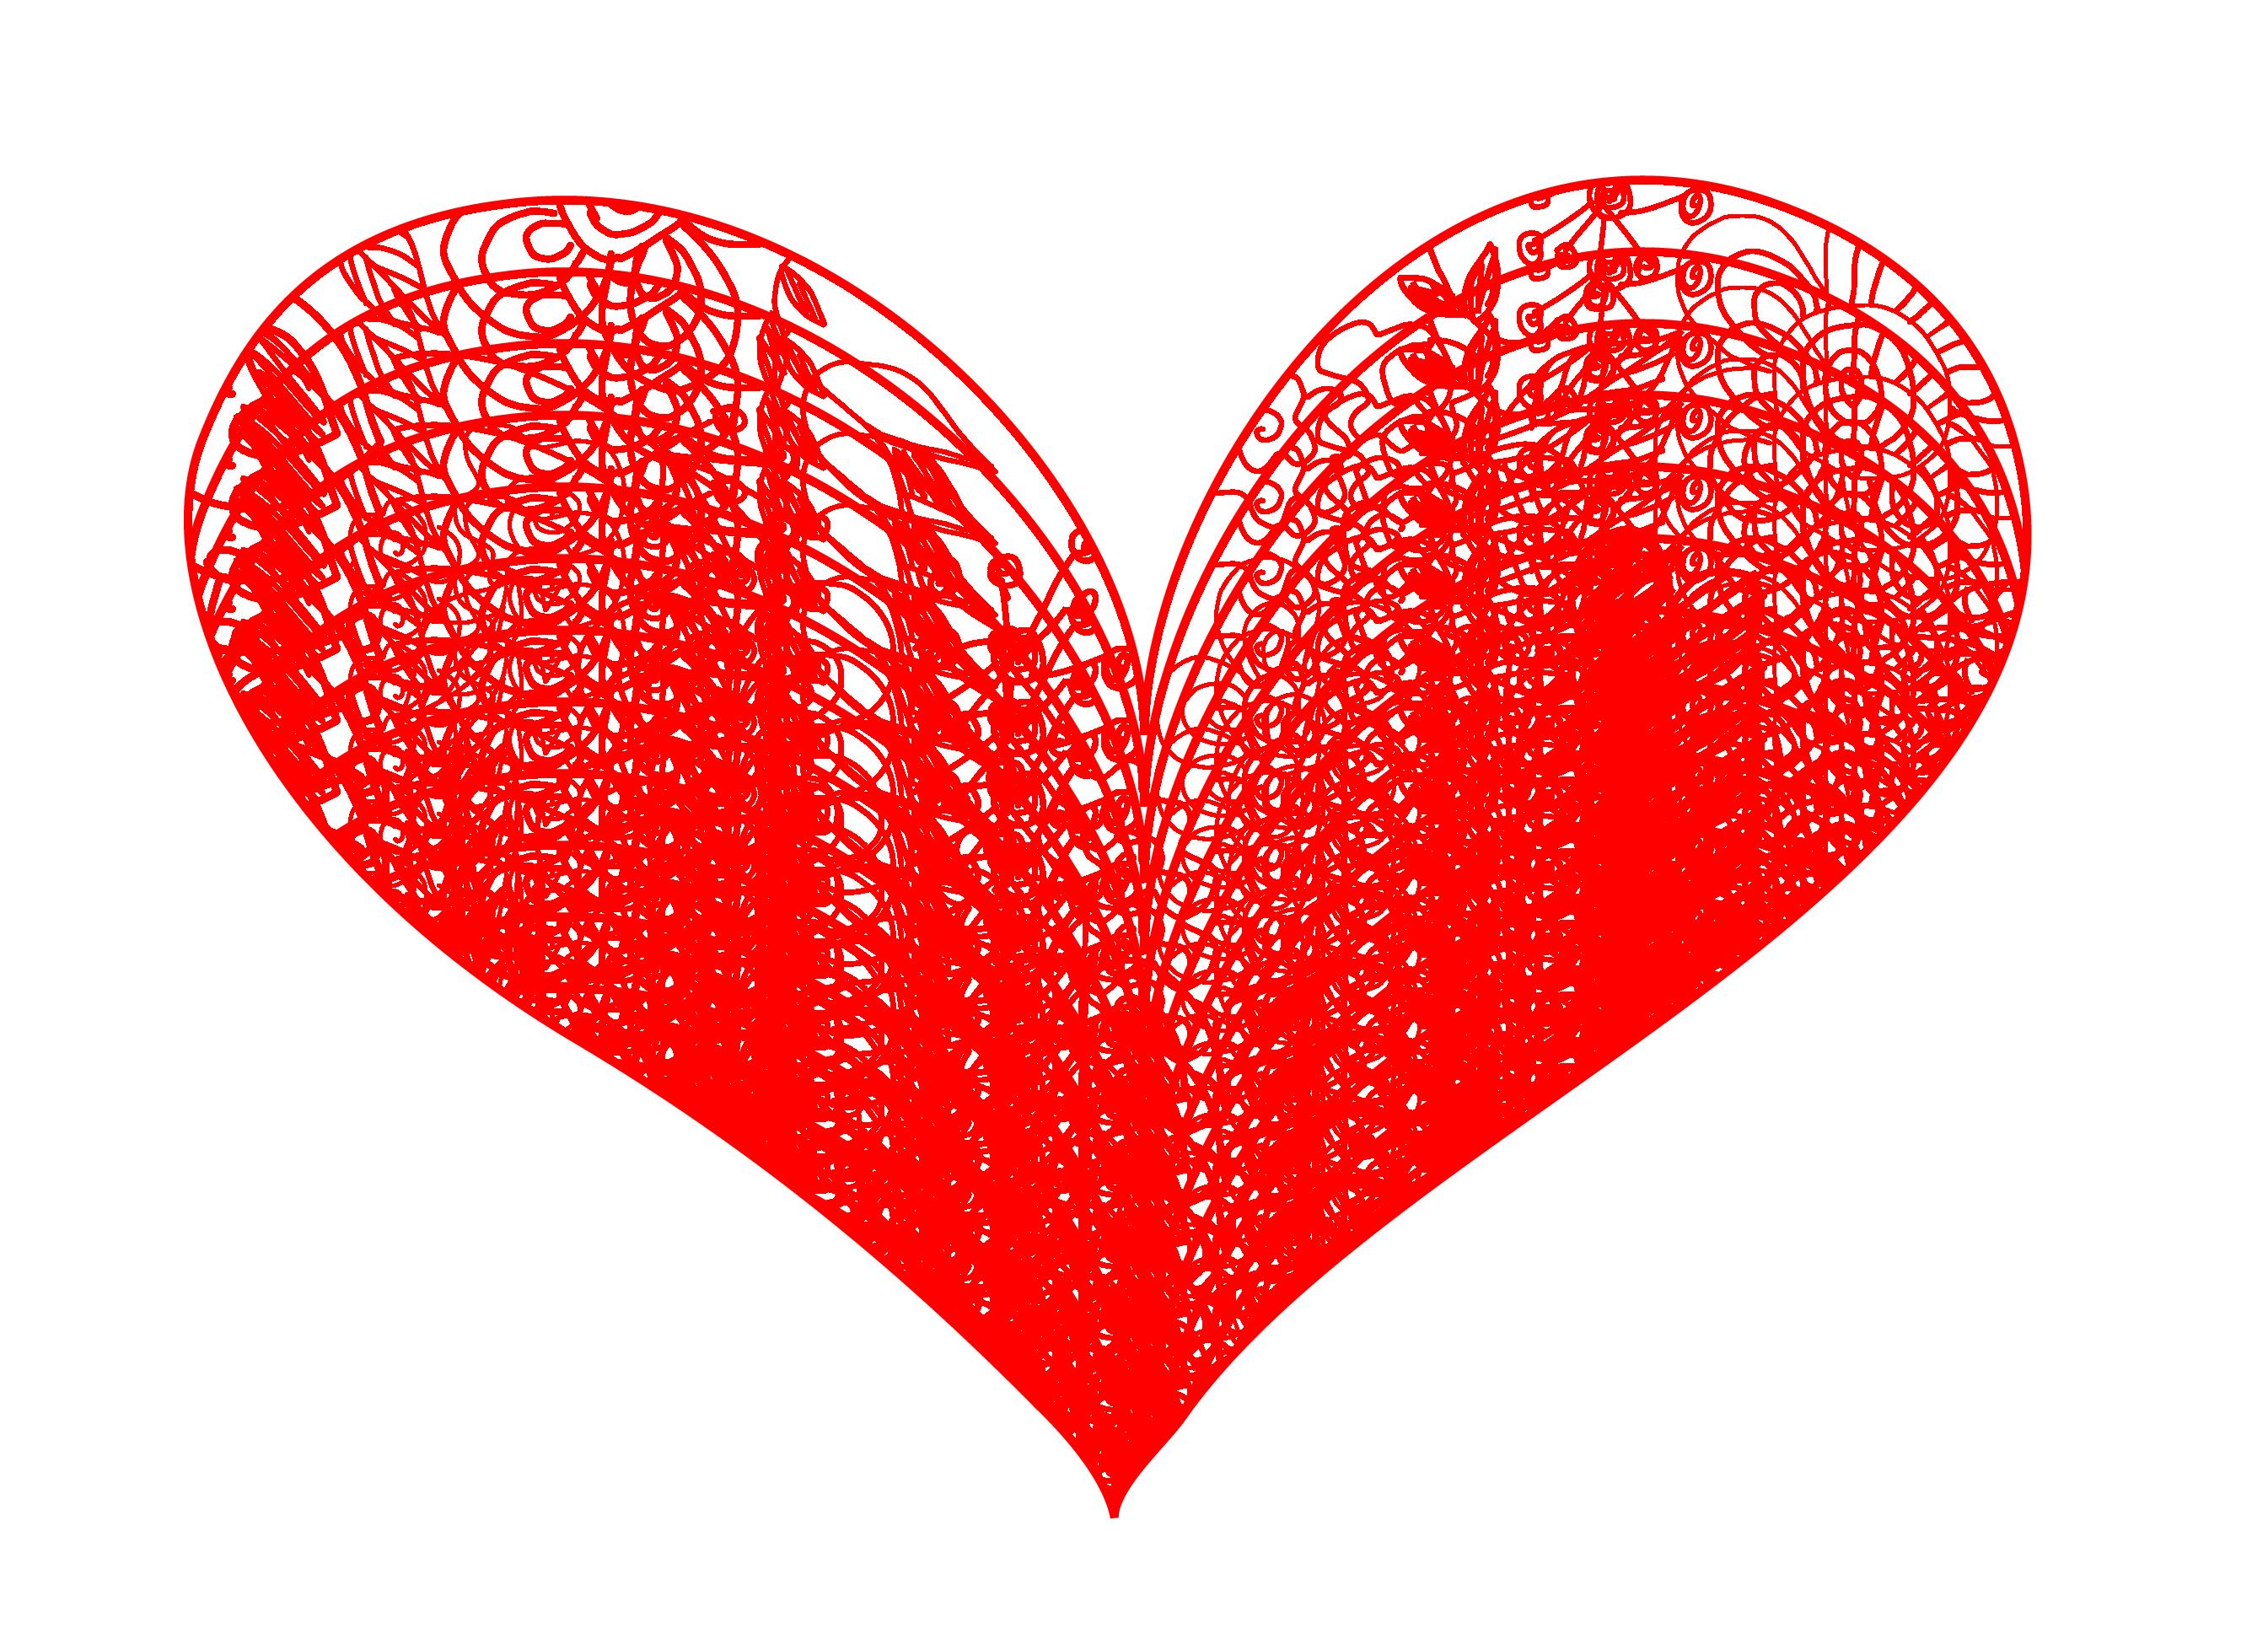 Retro clipart heart, Retro heart Transparent FREE for.